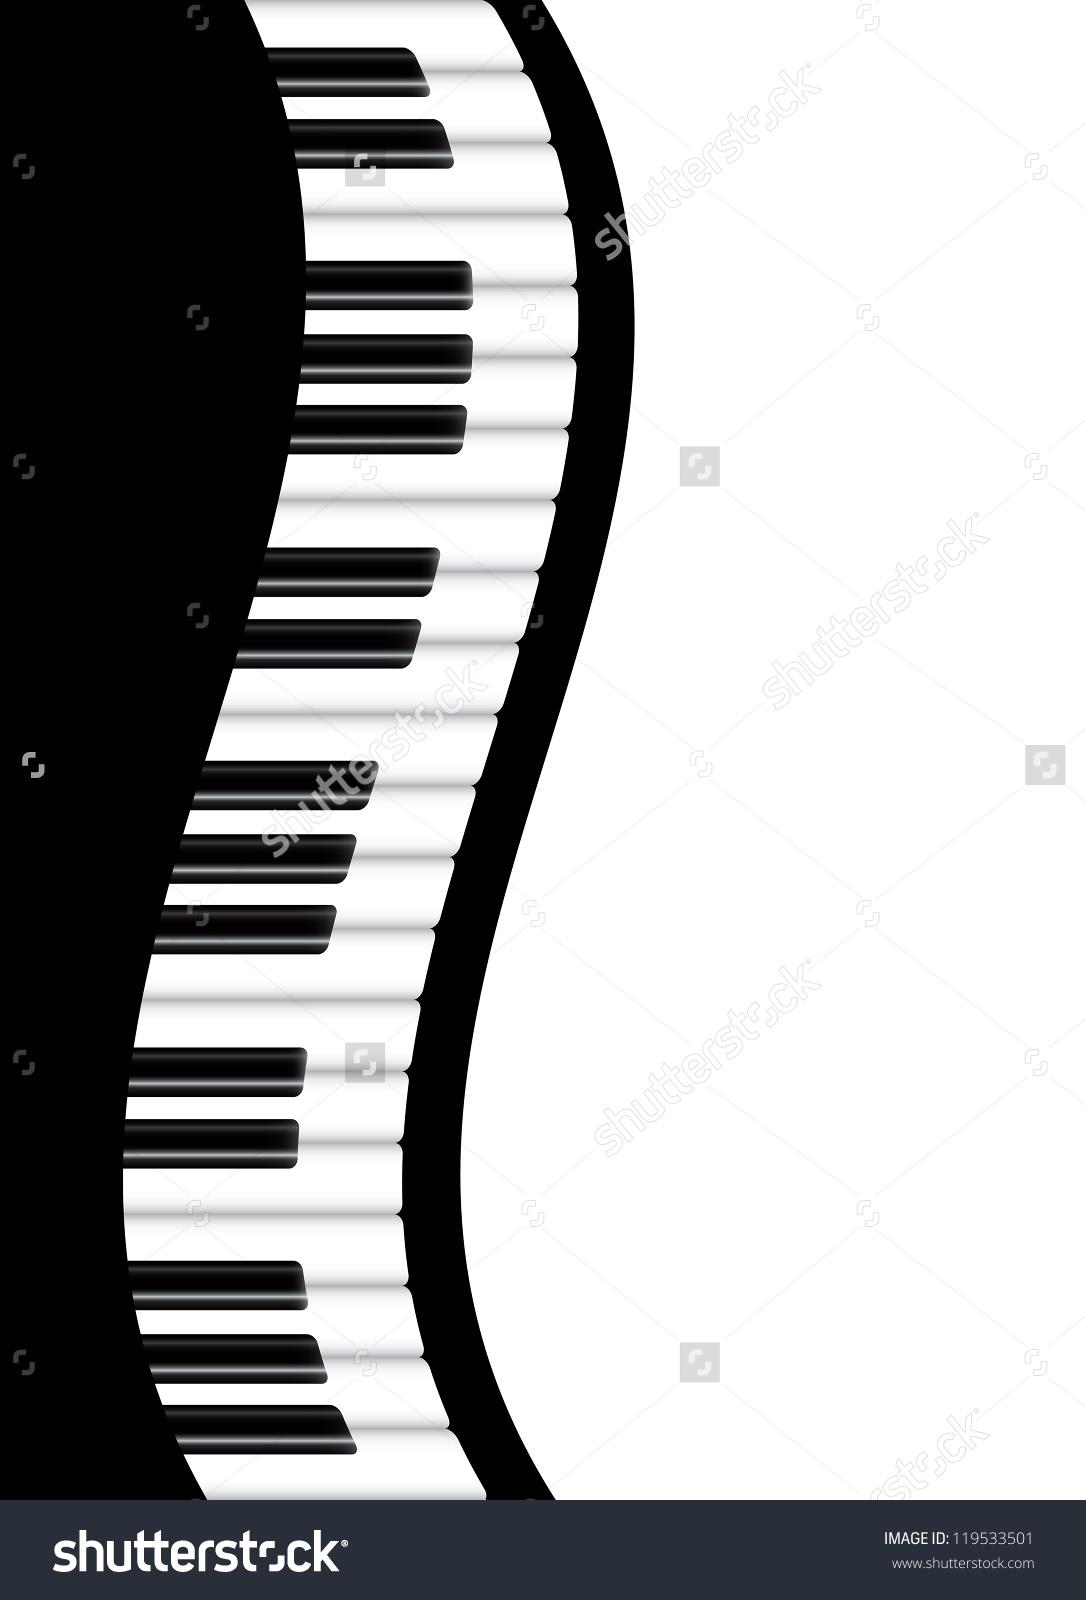 Piano Keyboards Wavy Border Background Illustration Stock.